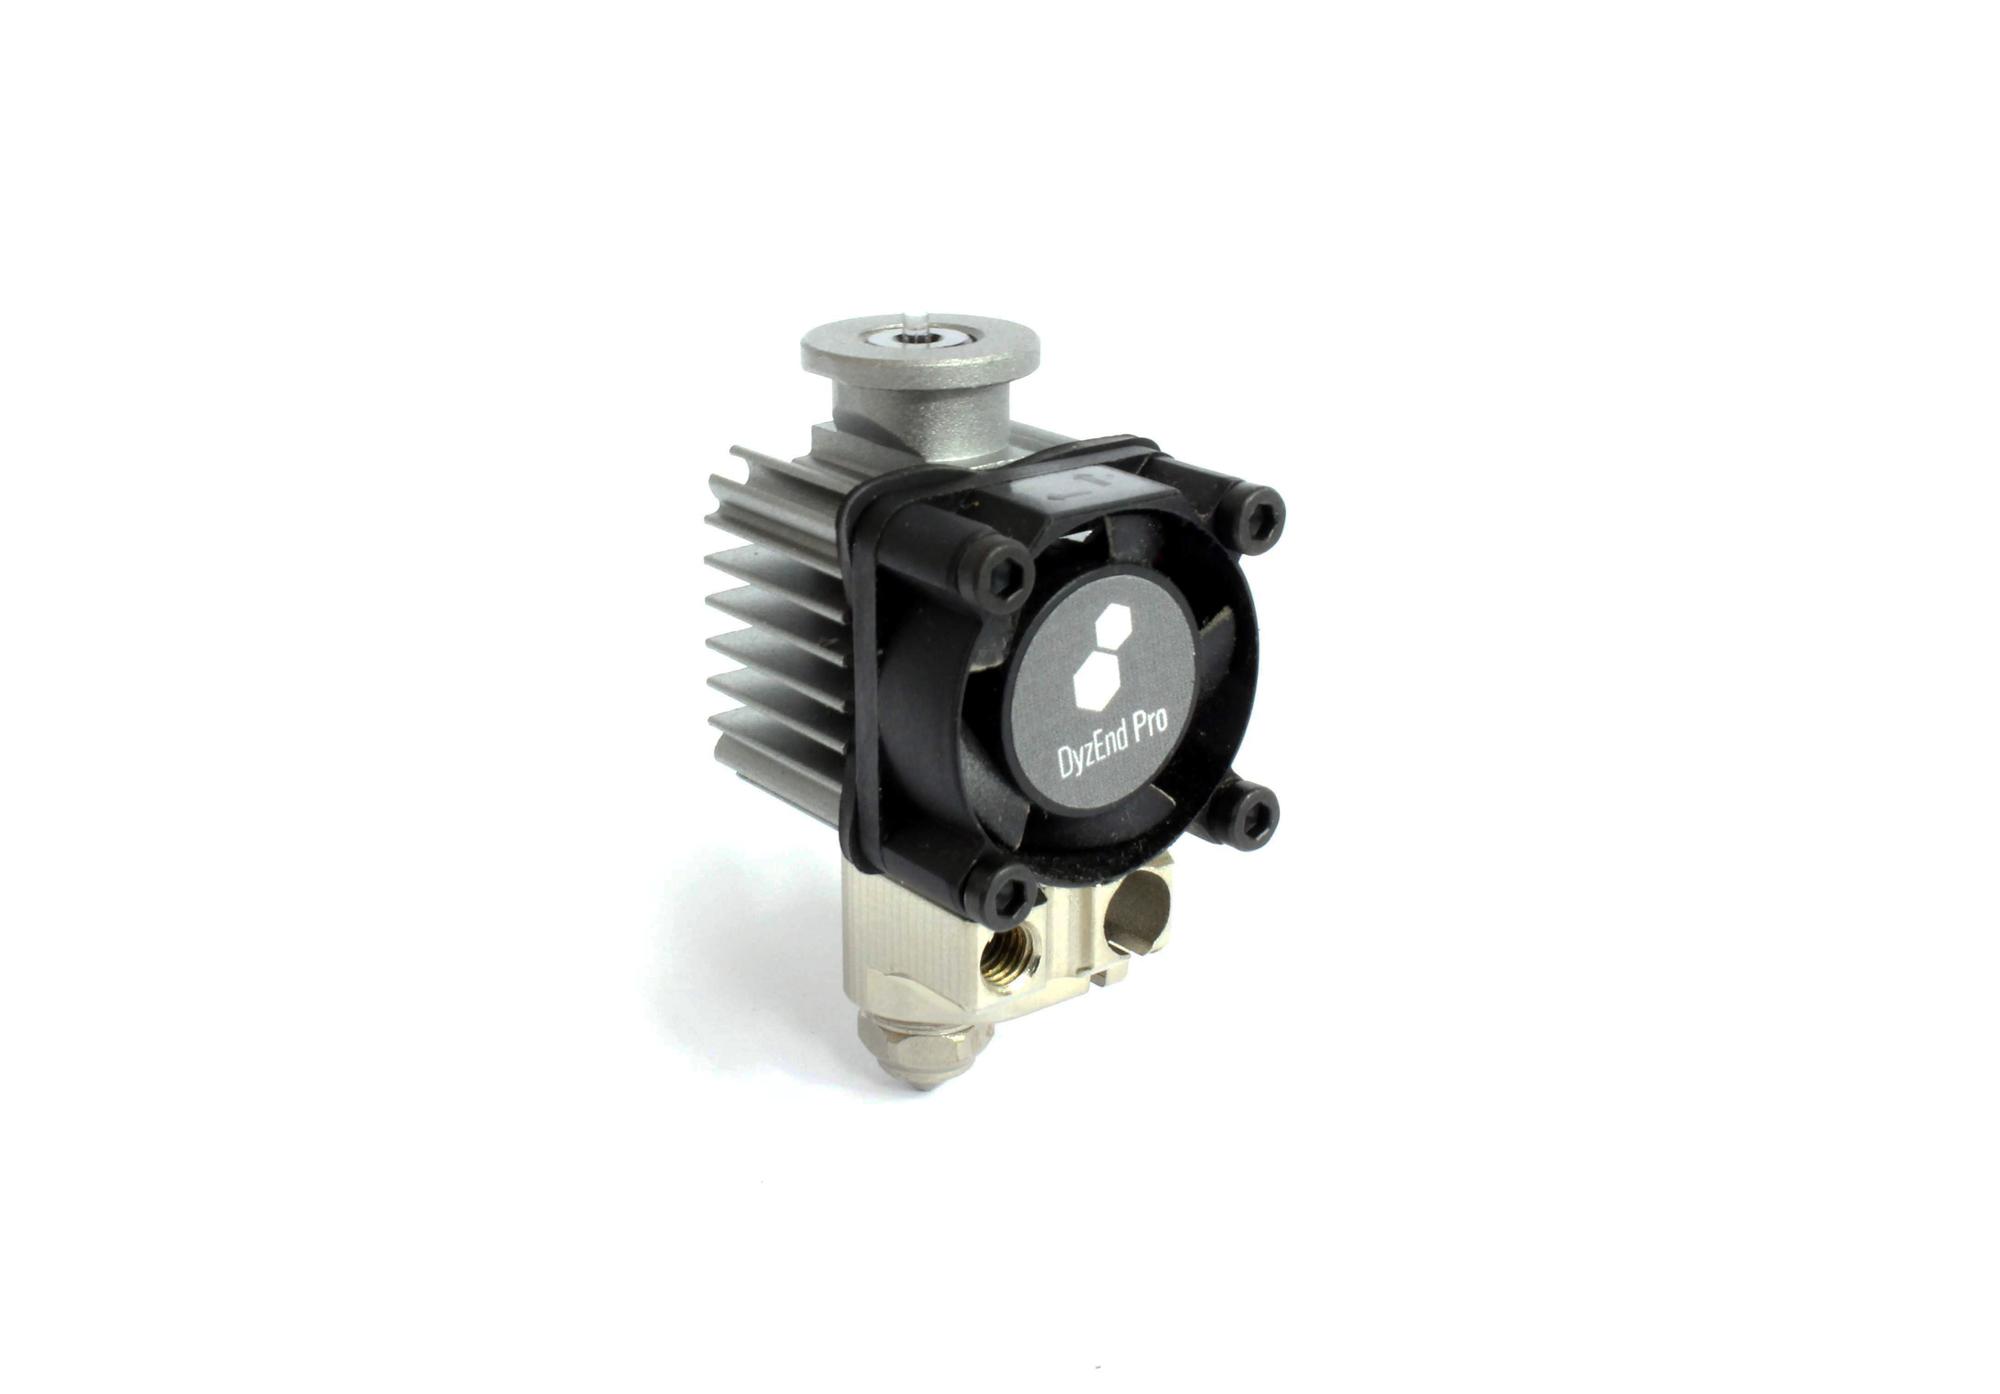 Dyze - DyzEnd Pro 500°C Hotend (12V / 40W / 0.4mm / 1.75mm)